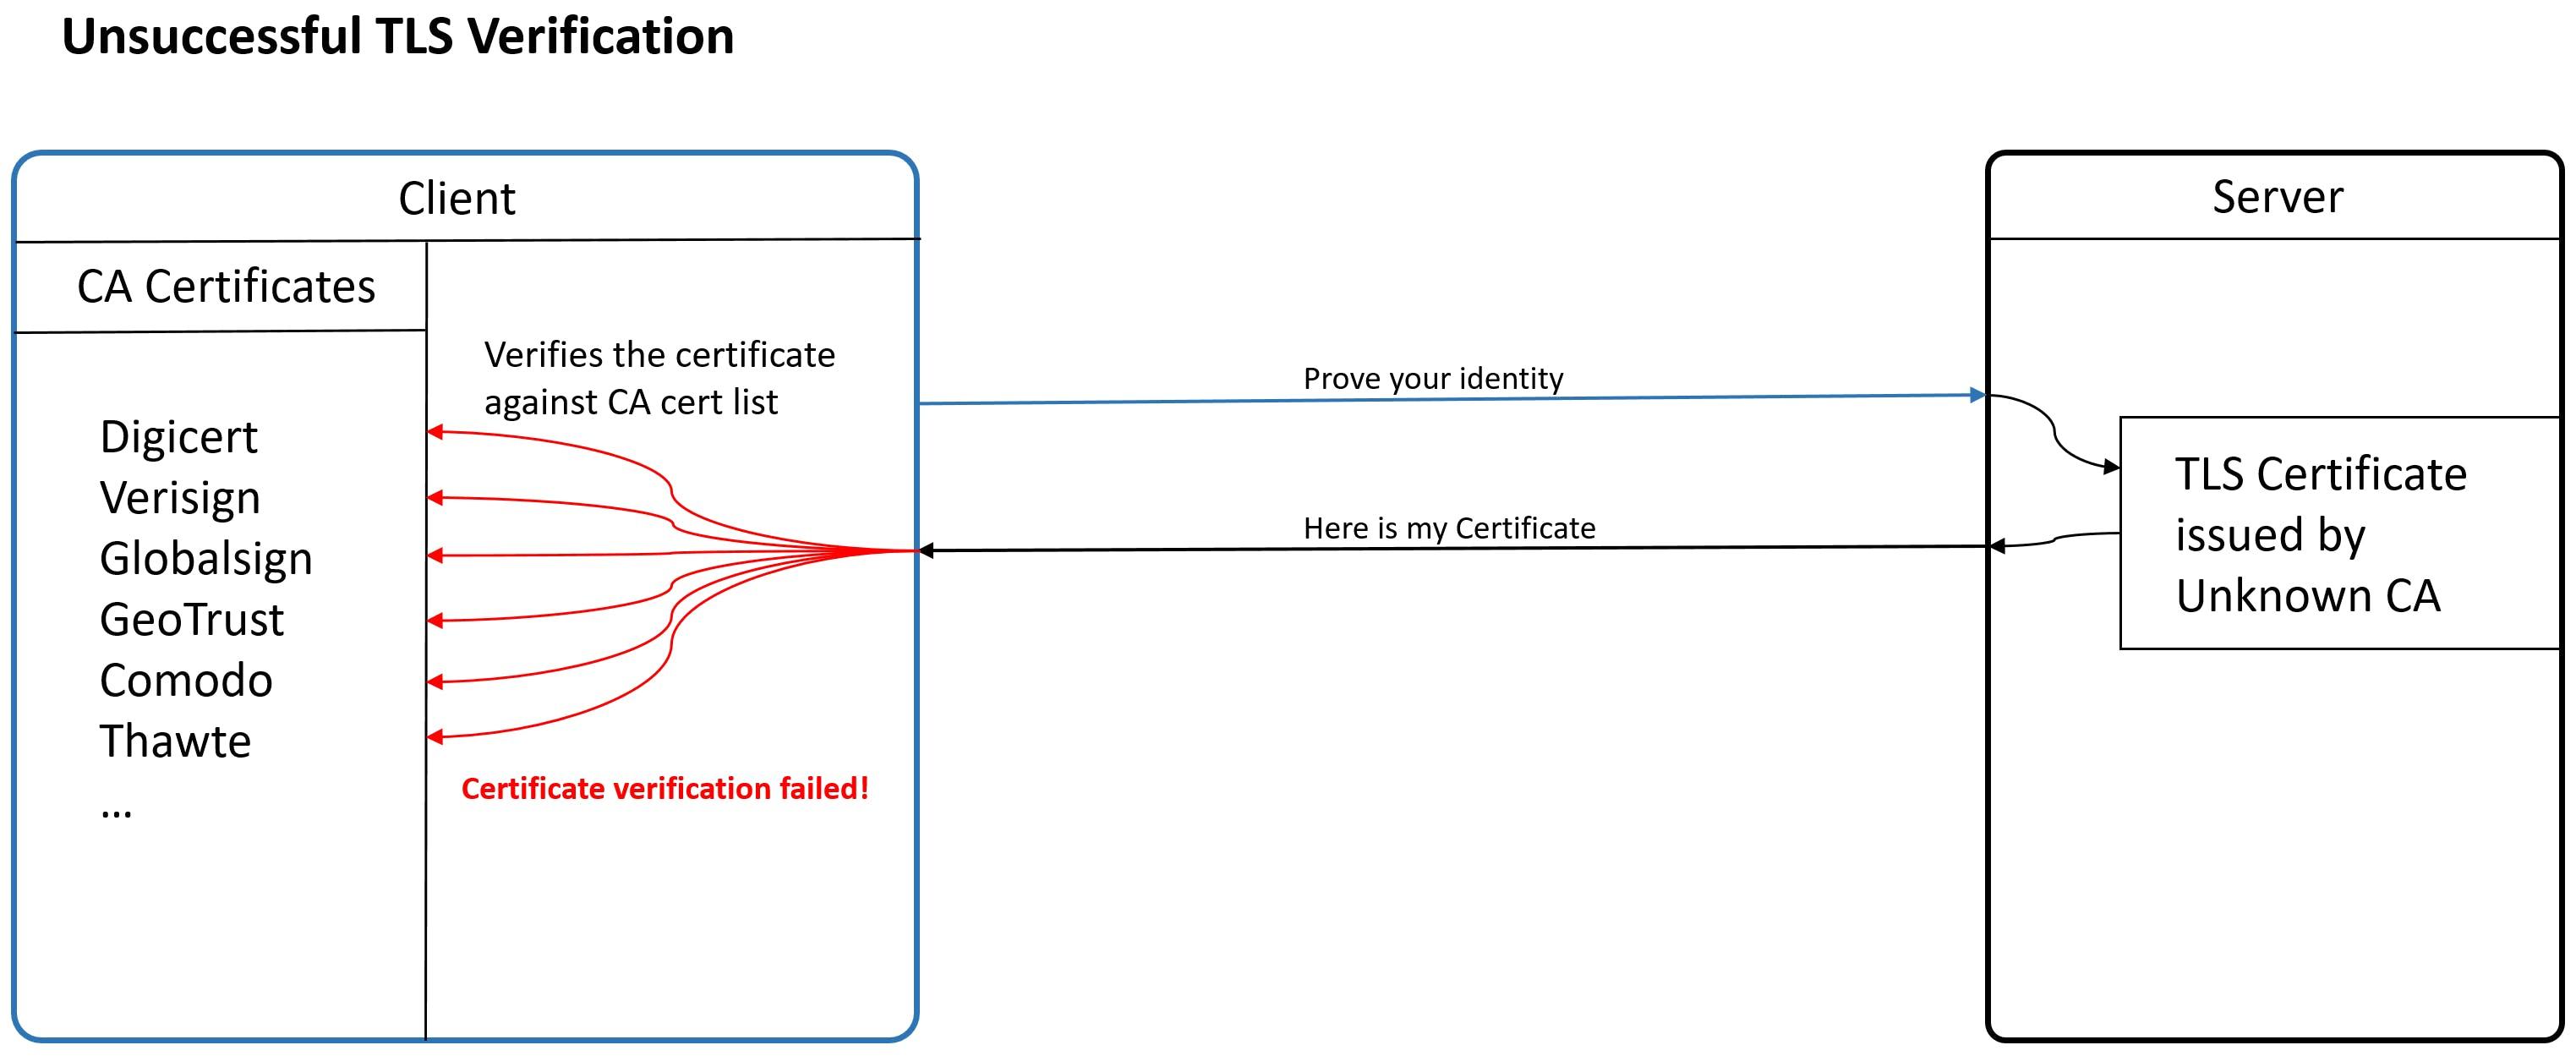 unsuccessful tls verification.PNG